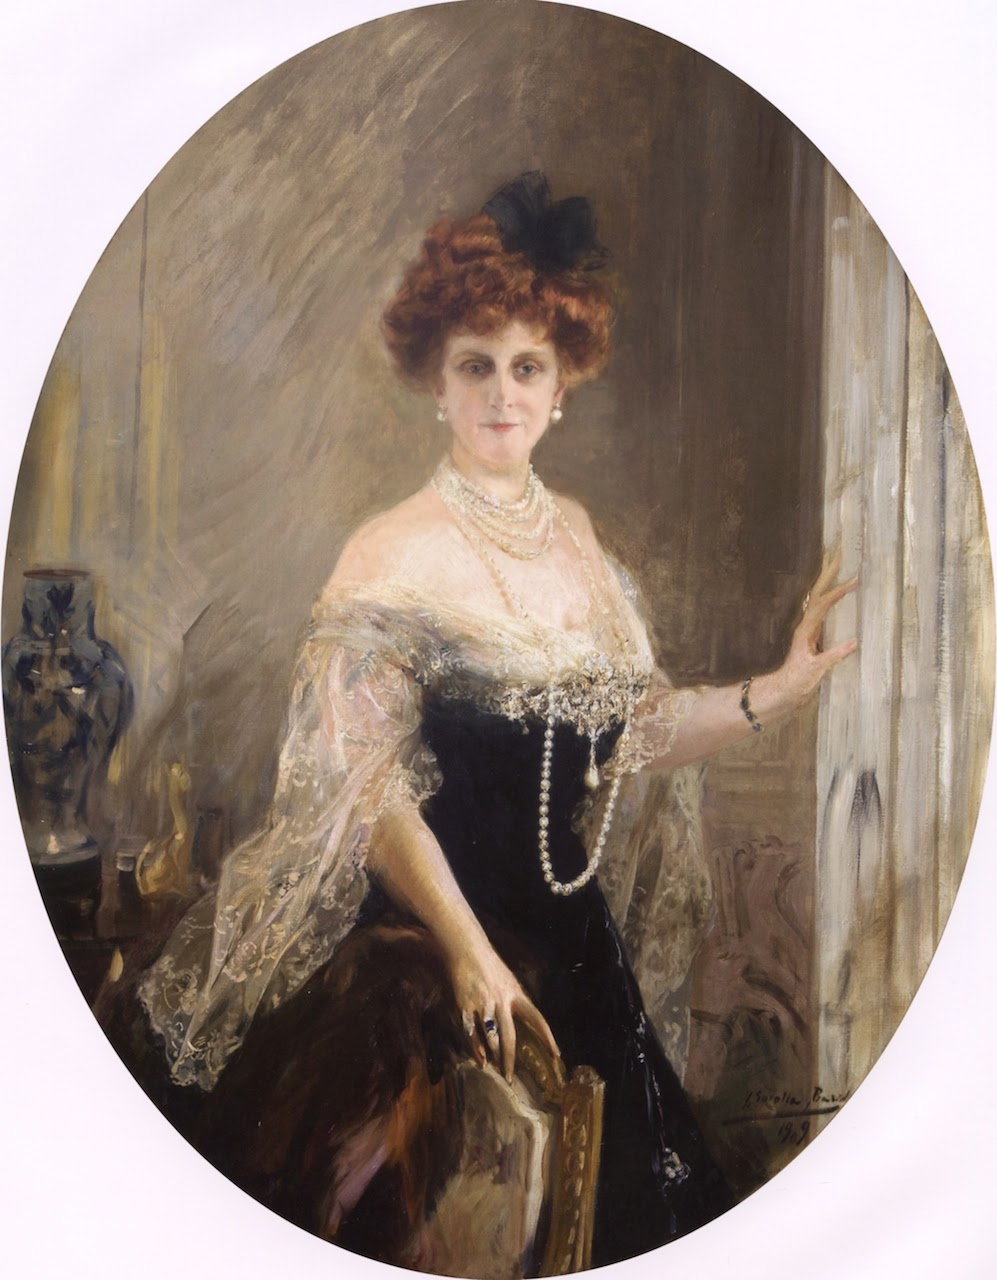 Mrs. Charles B. Alexander, Joaquín Sorolla, Retratos